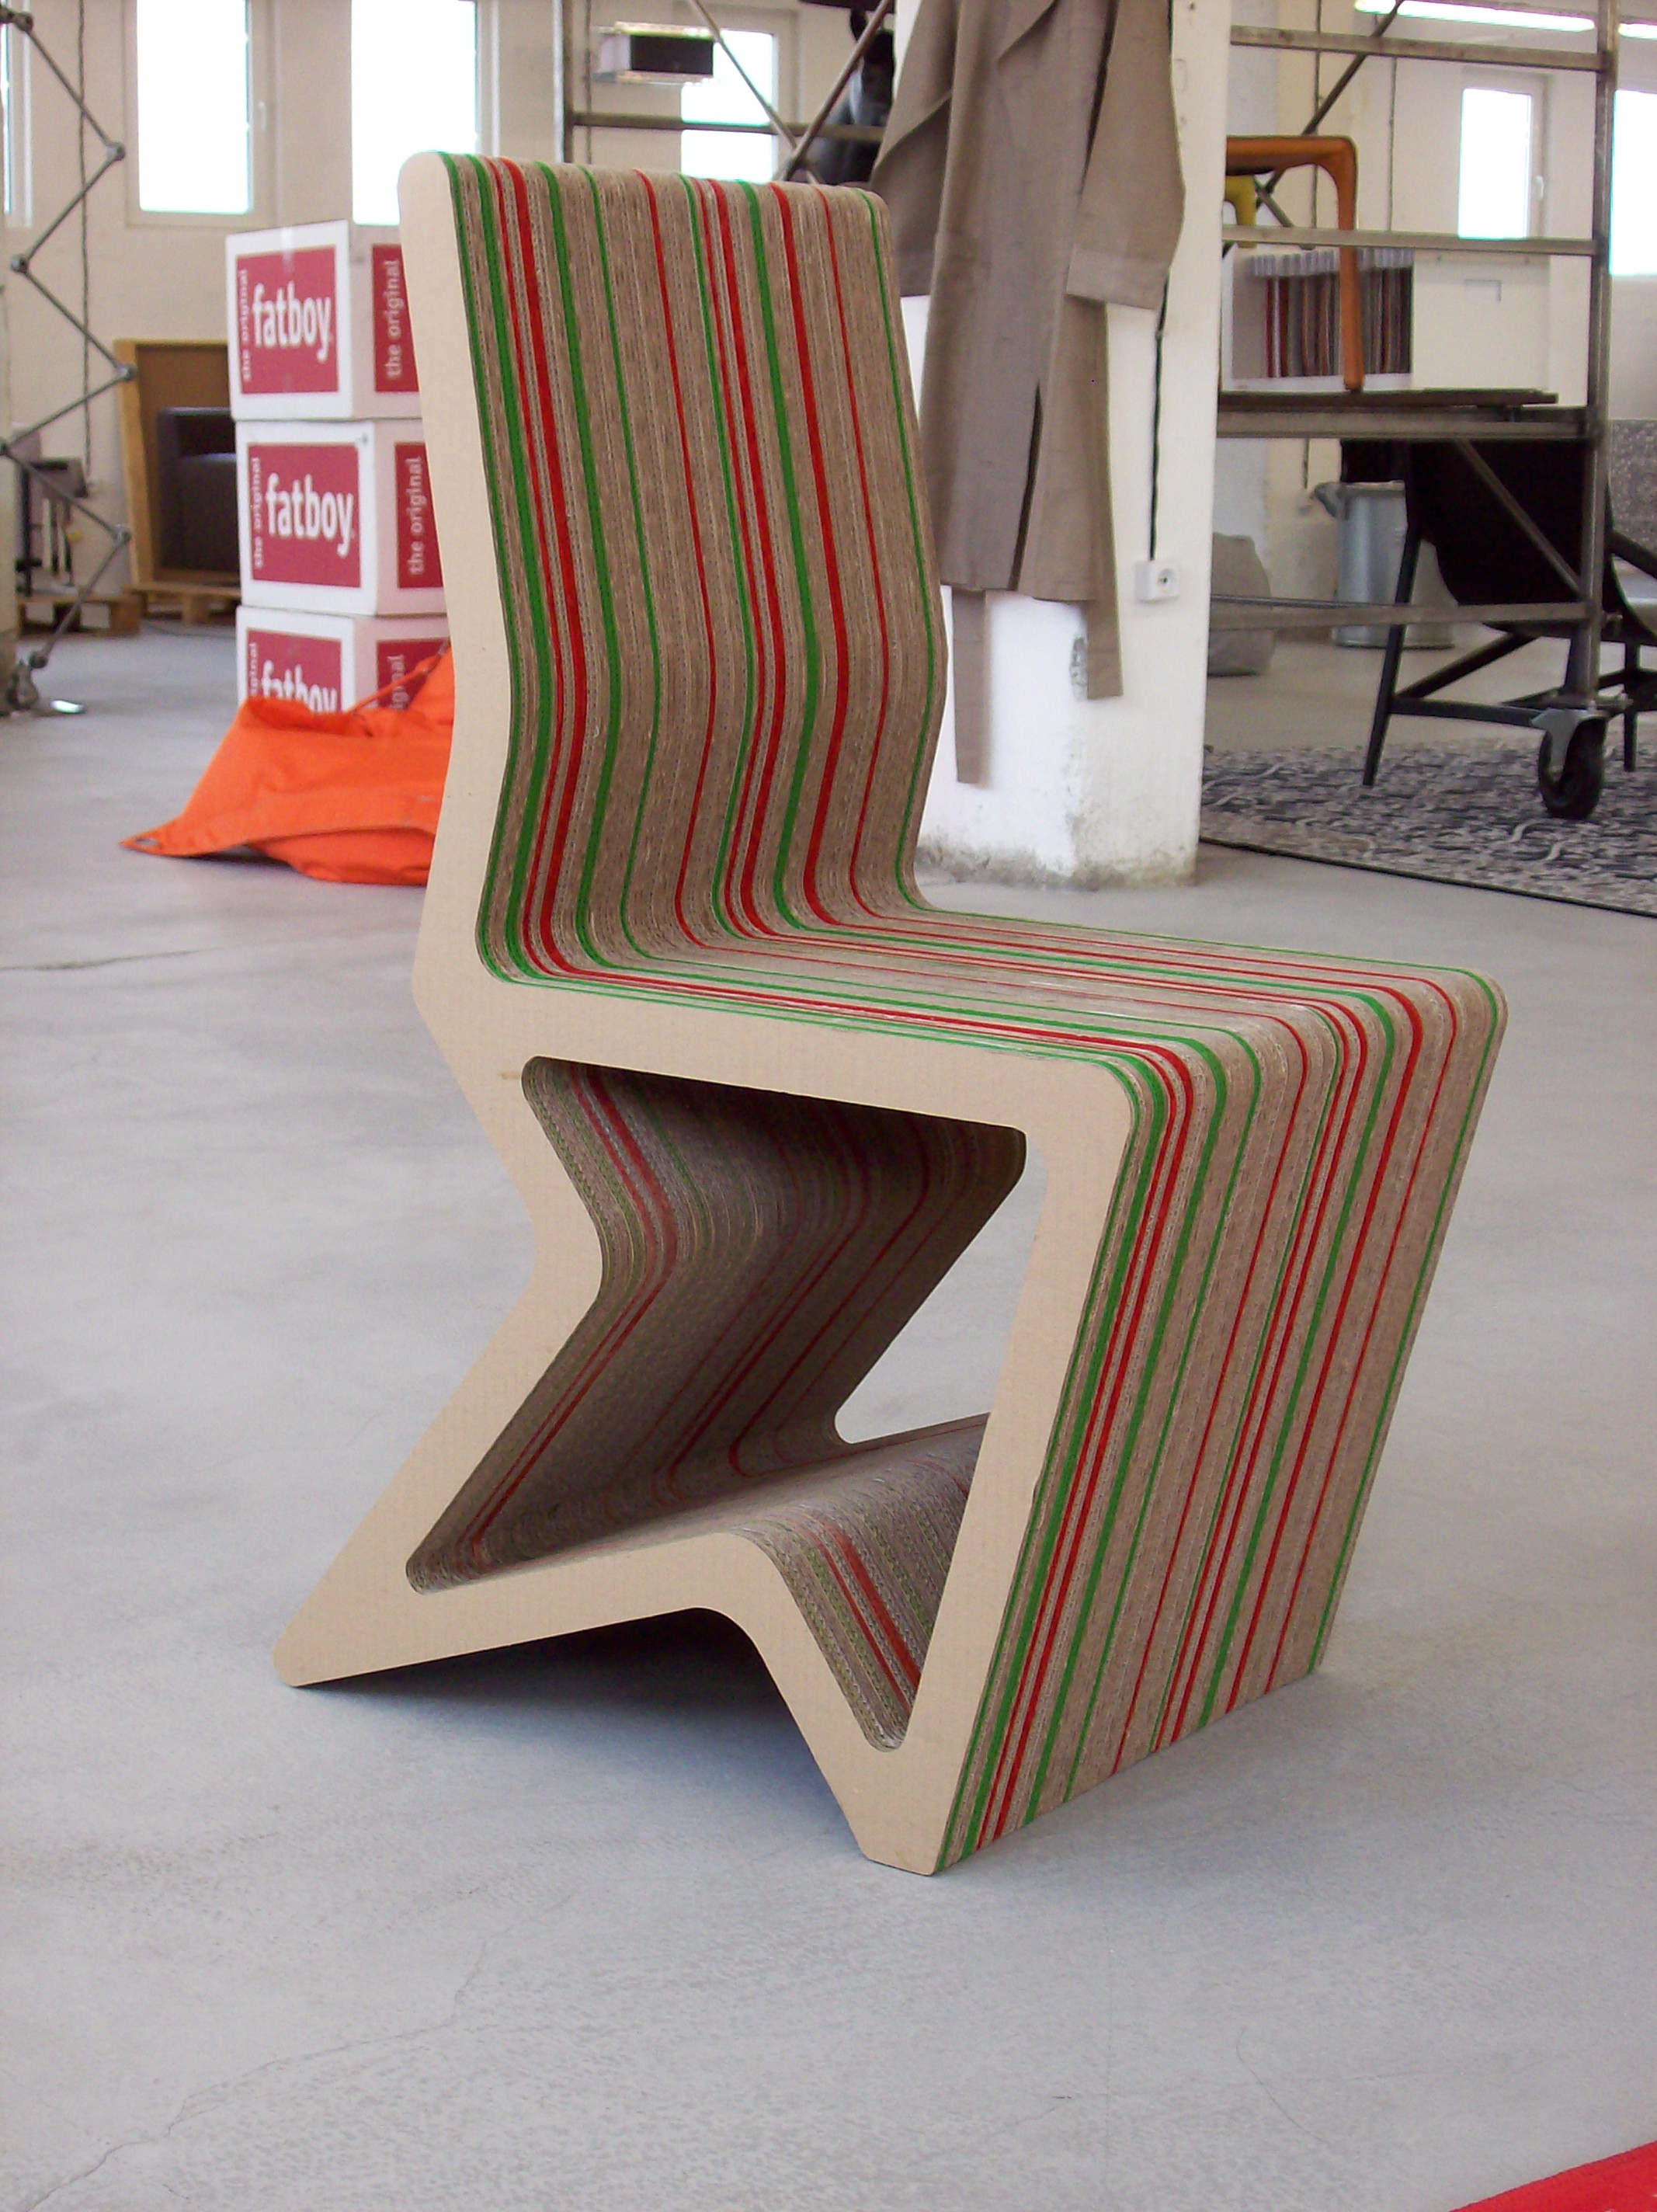 Cardboard furniture by Konstantin Achkov at Coroflot